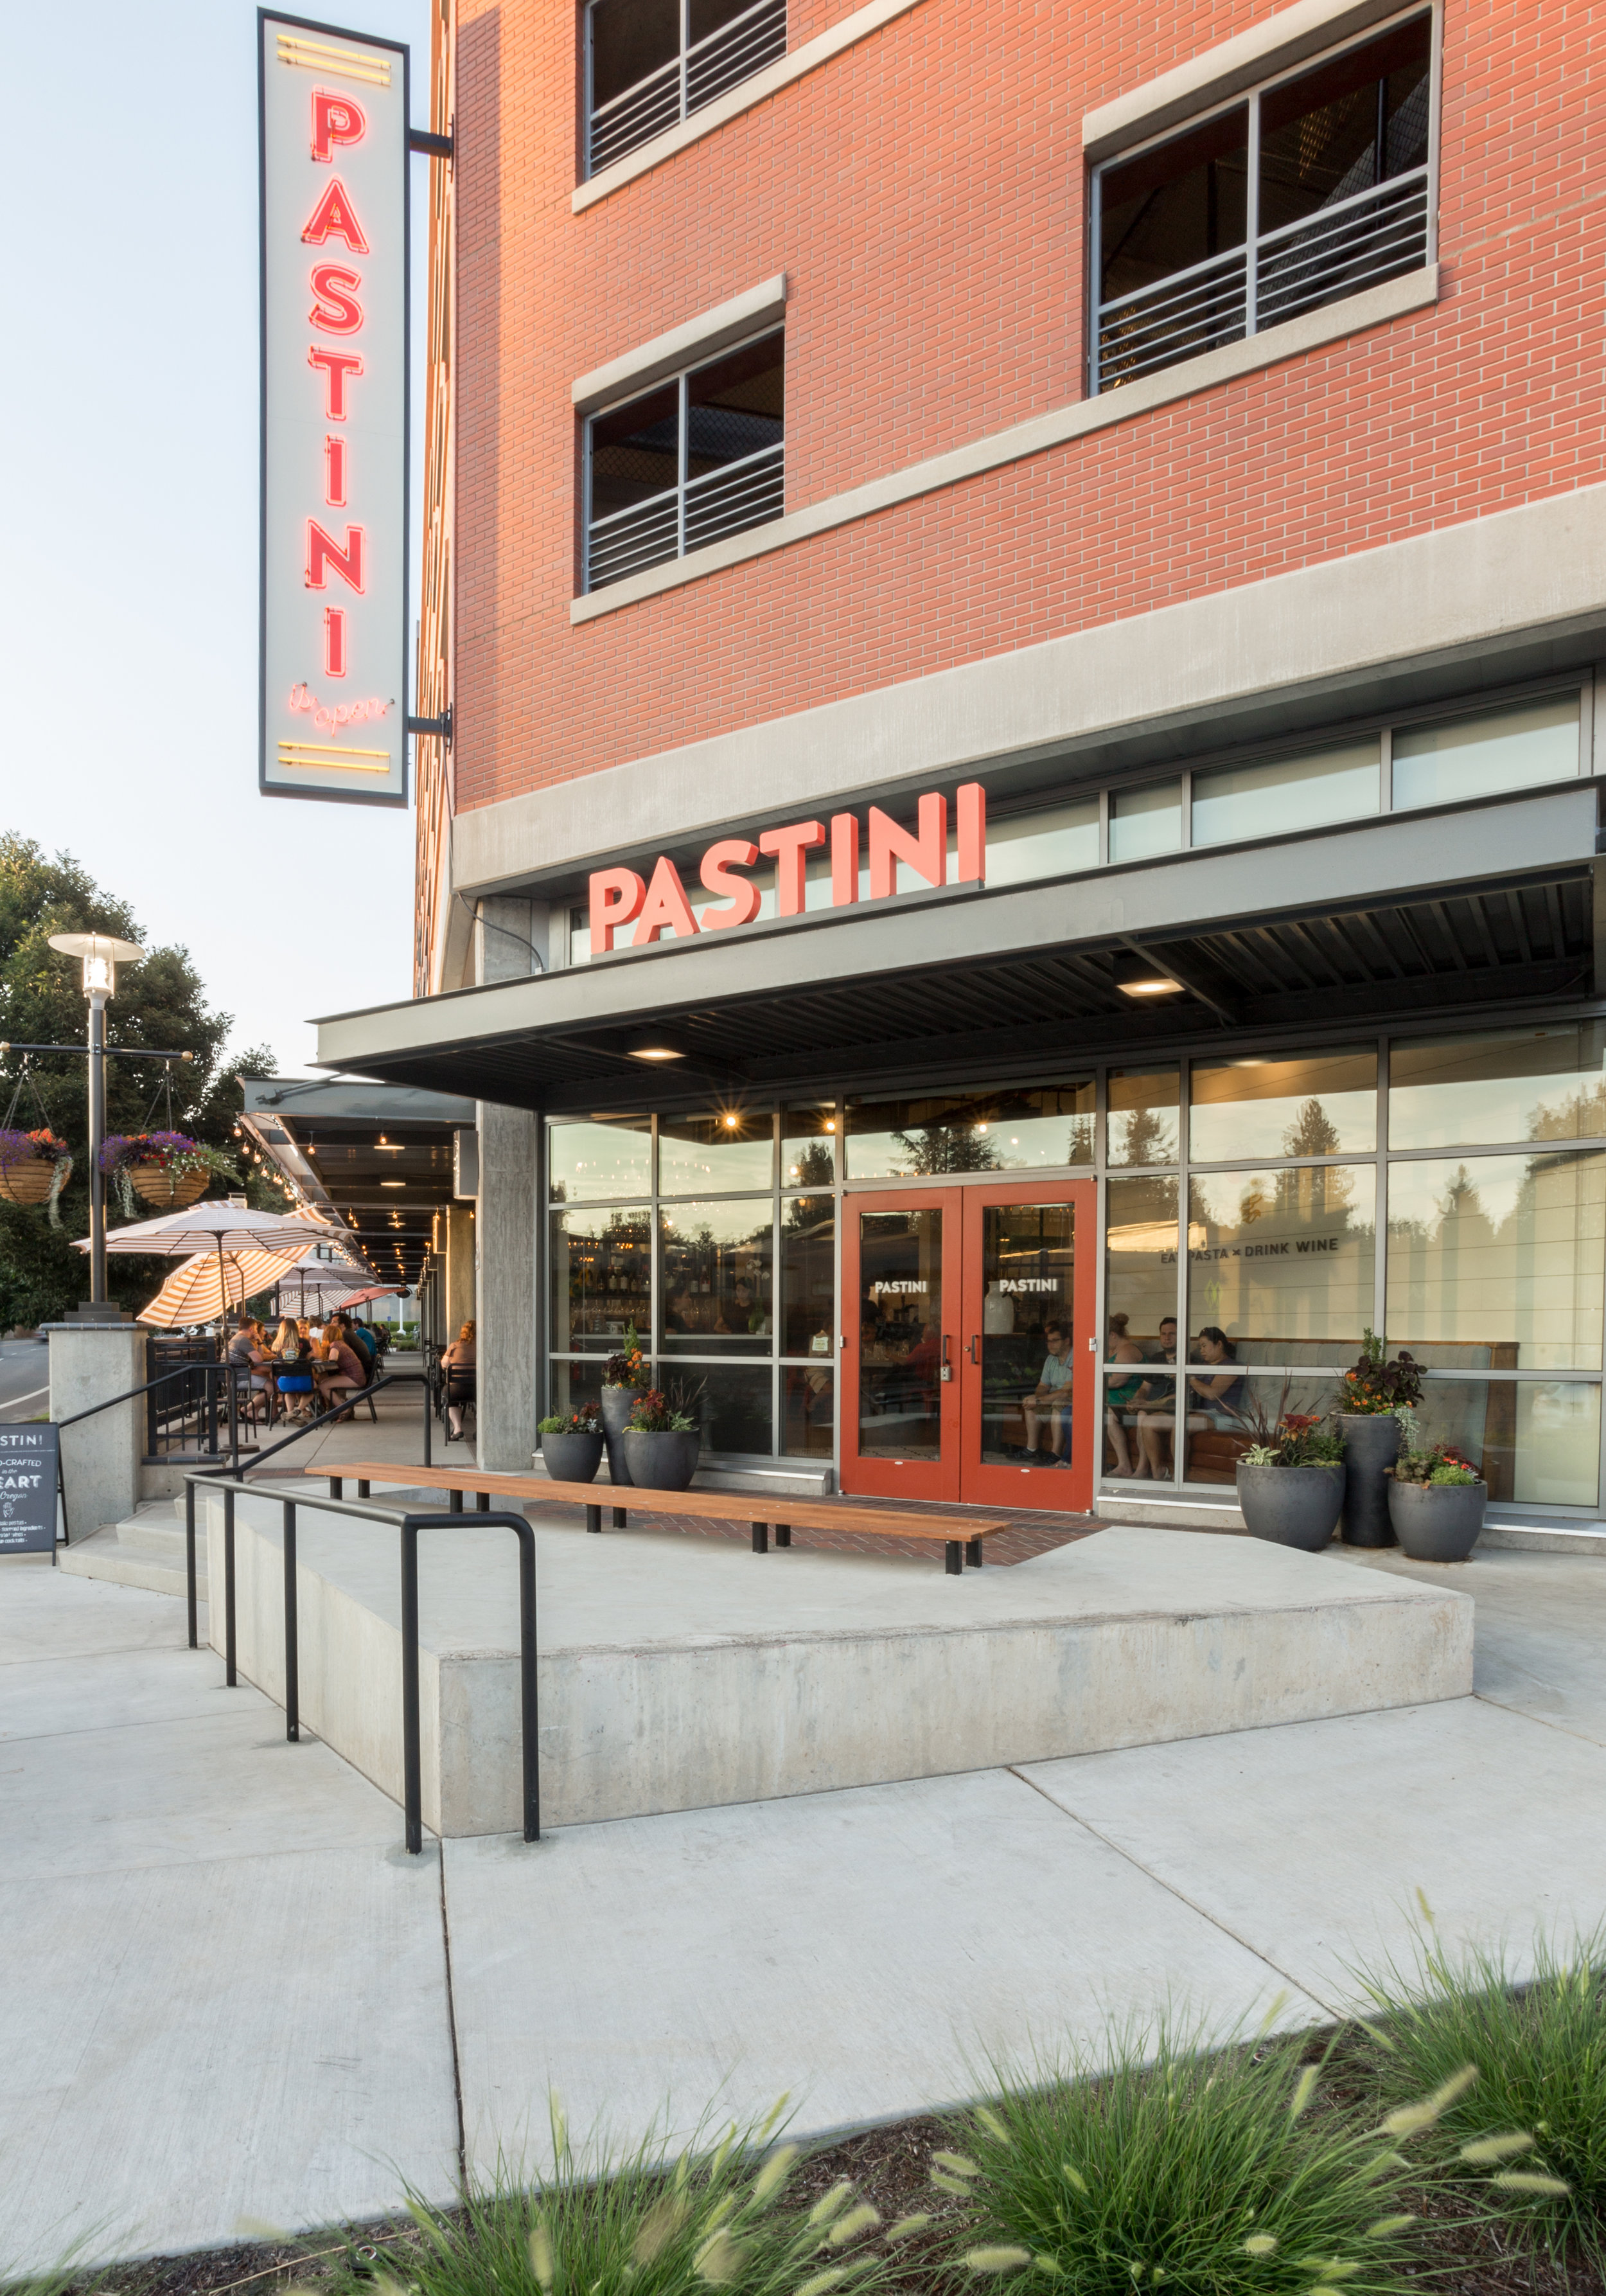 EMERICK-Pastini-8-4-2017-146.jpg